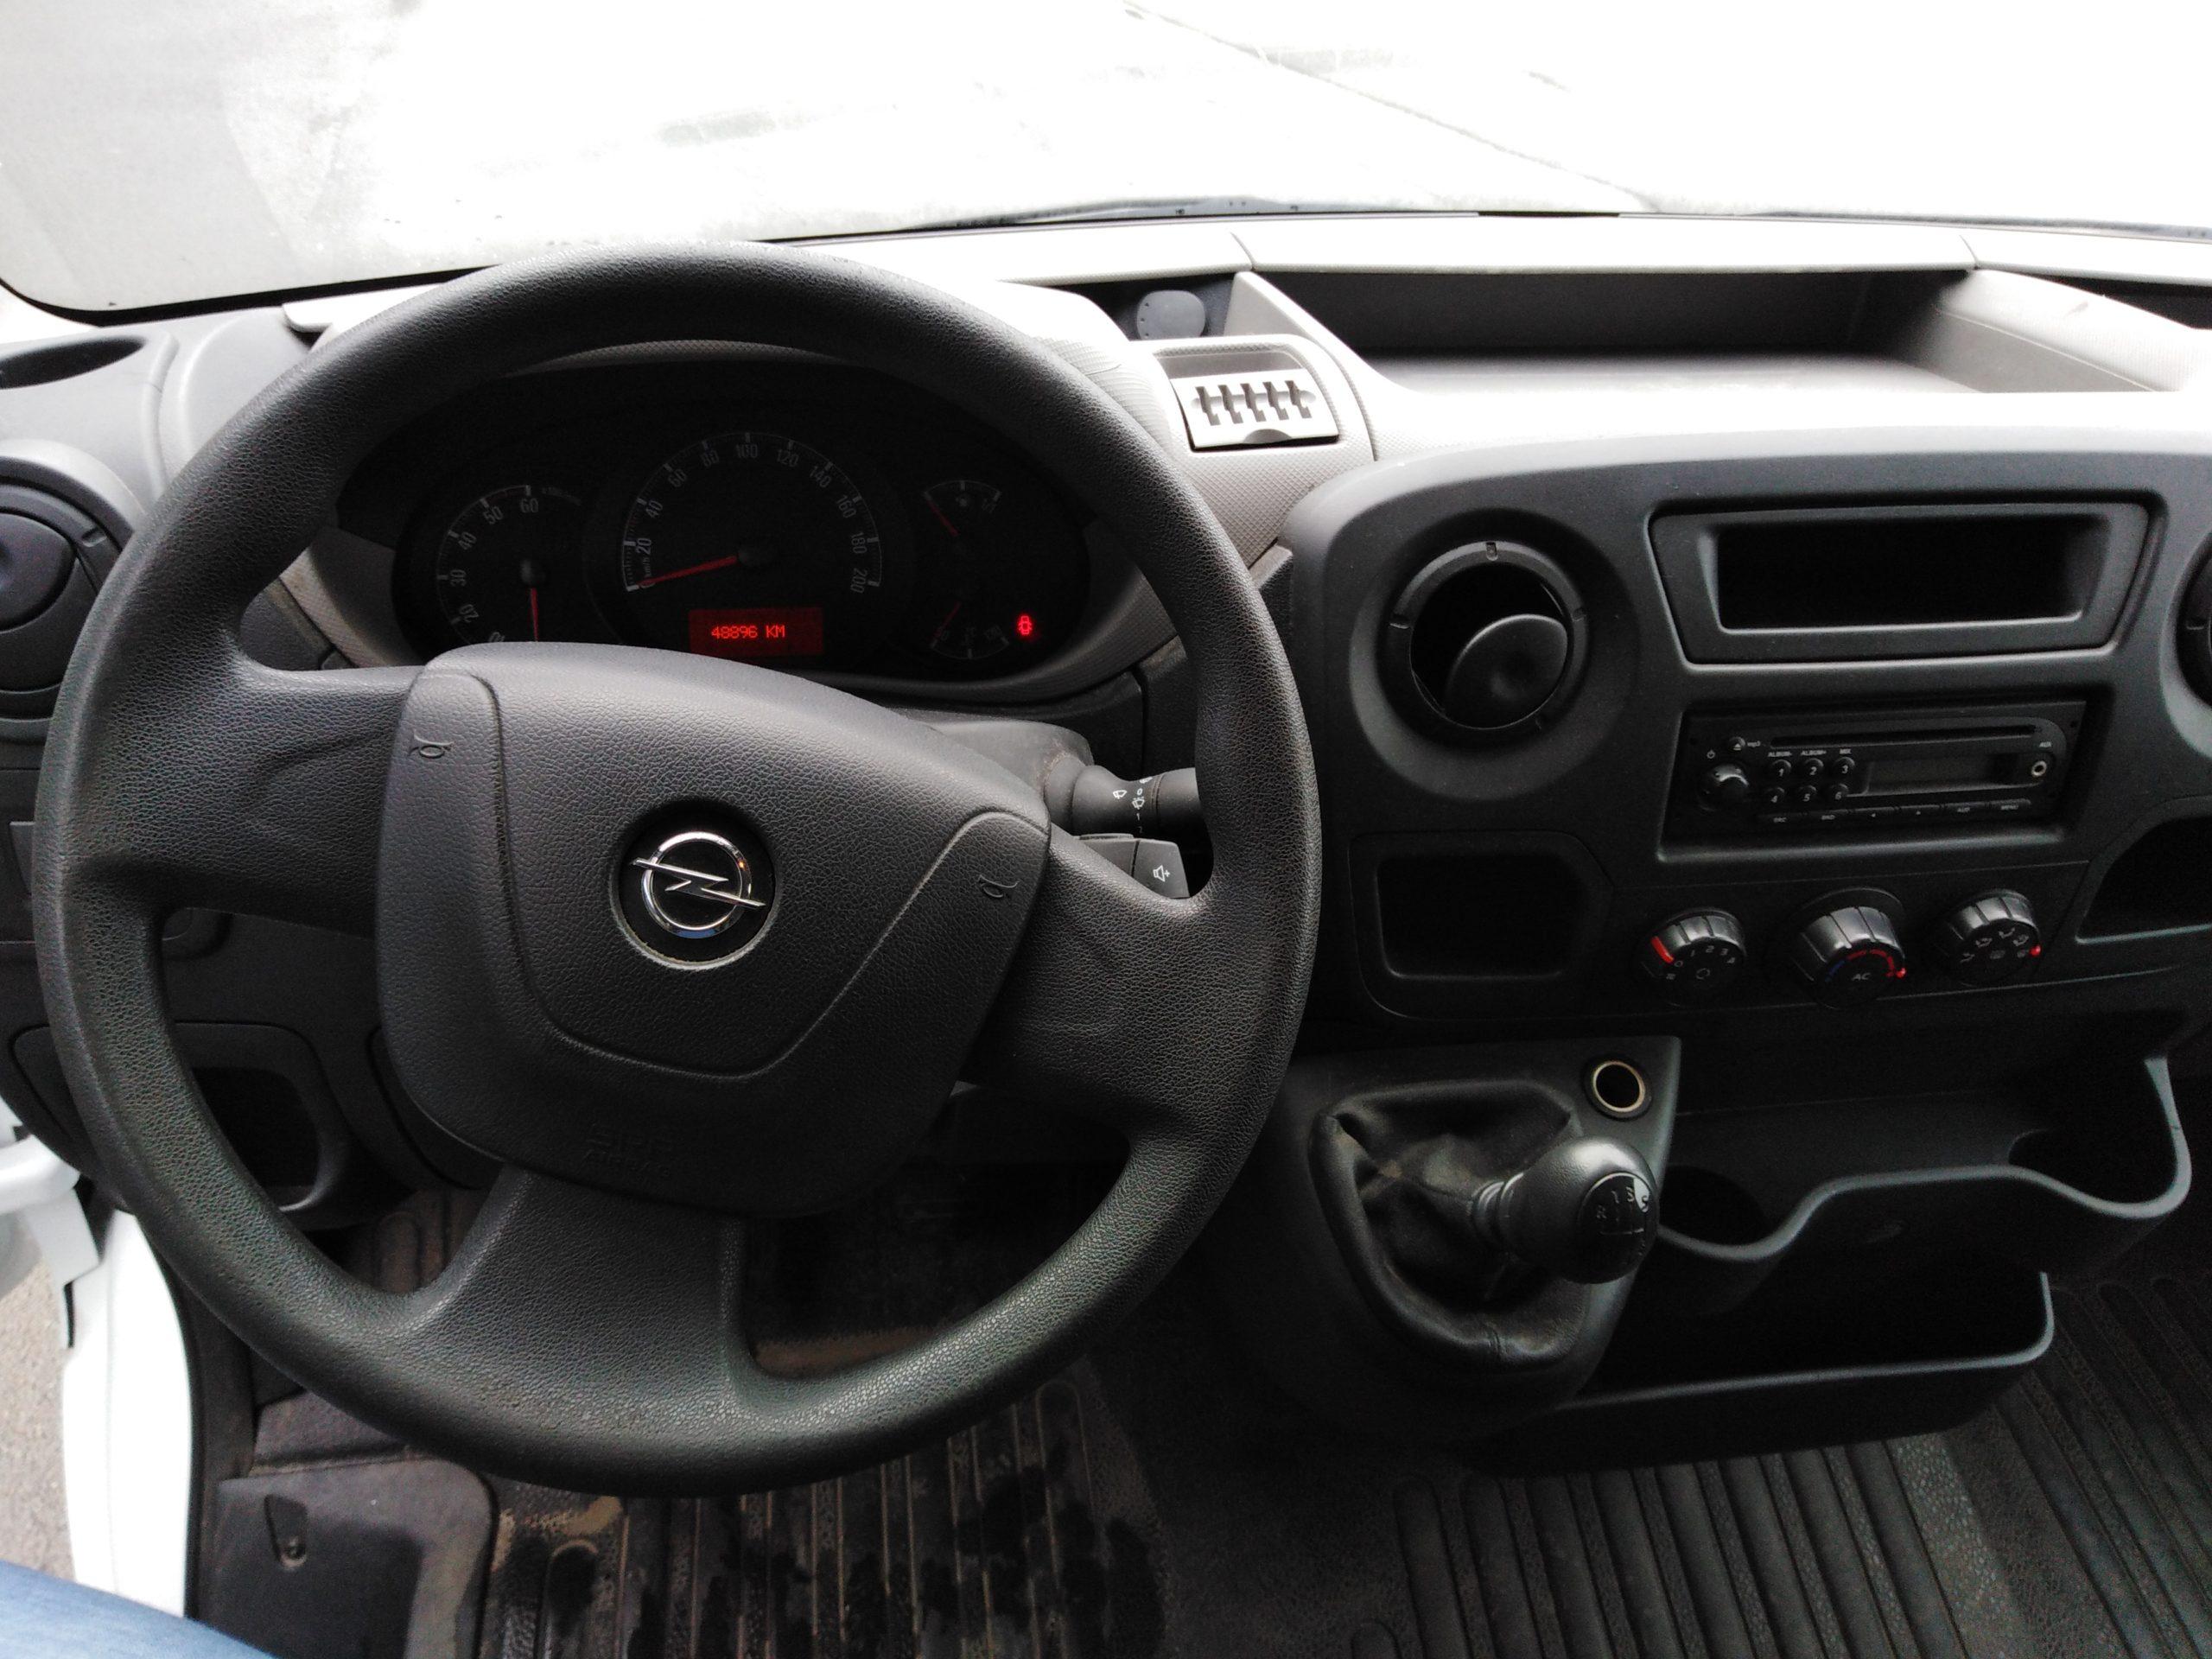 Location d'un utilitaire fourgon à caisse grand volume - Opel Movano 20m3 - Vue7